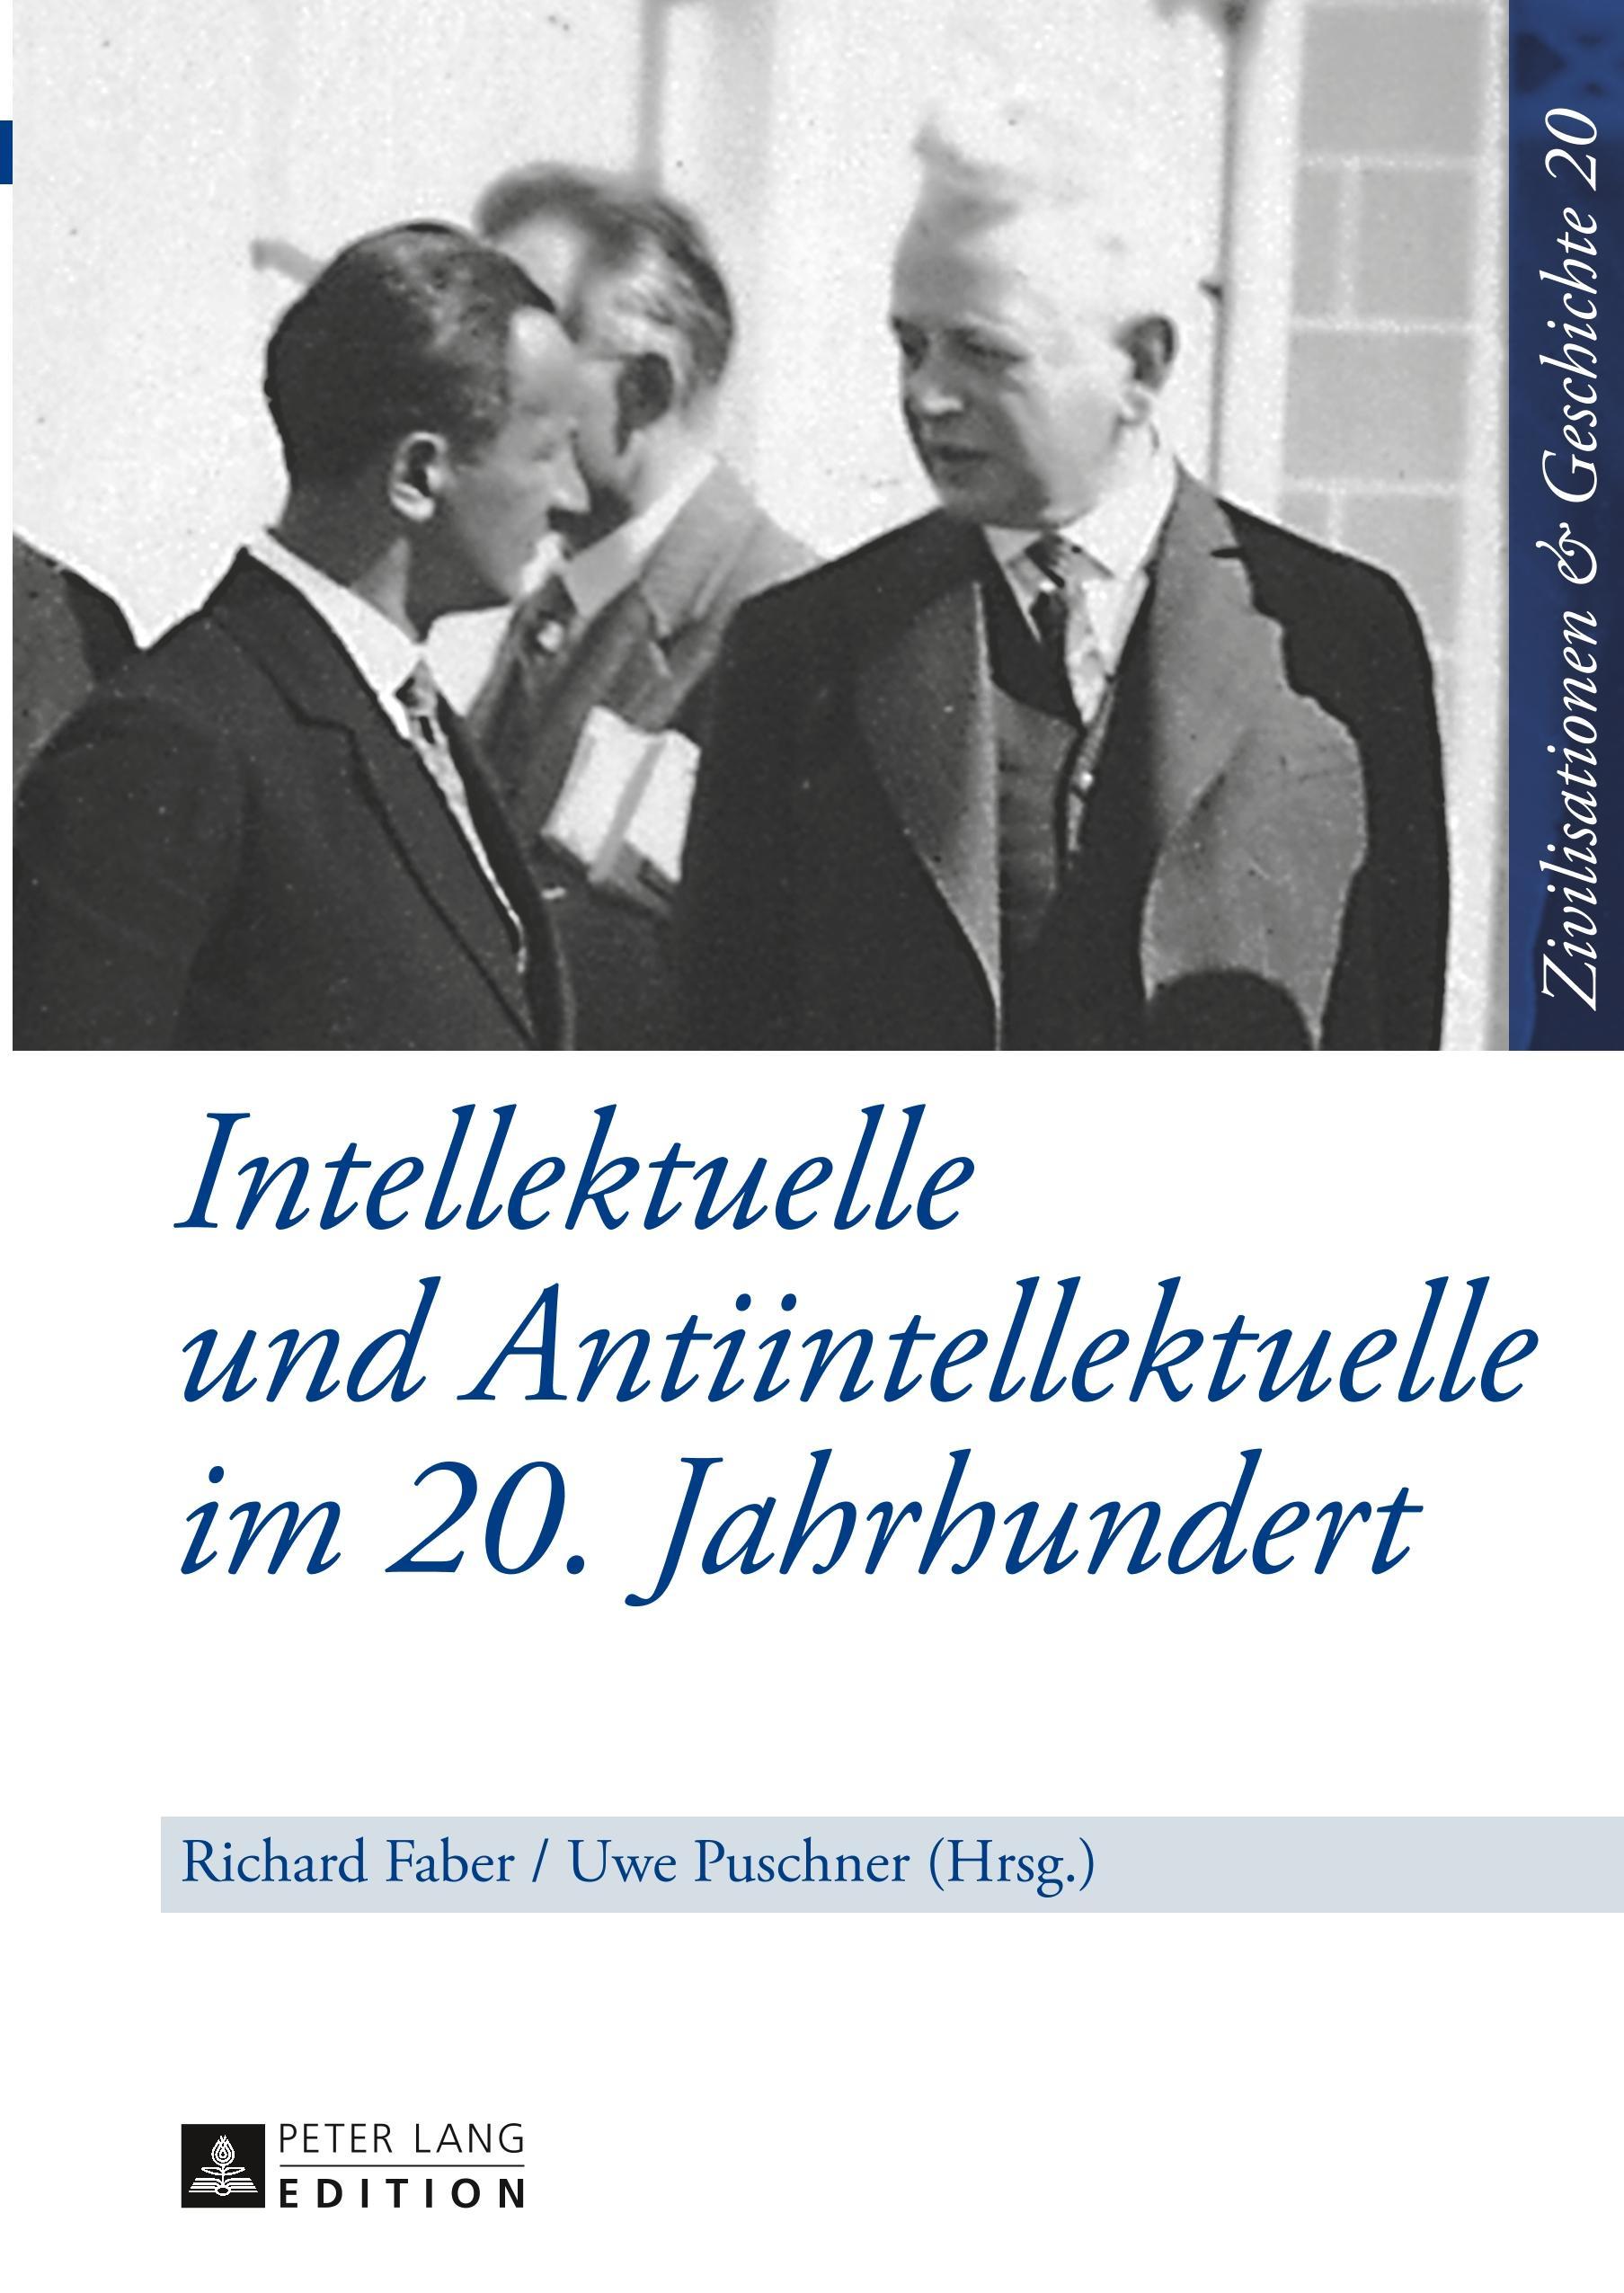 Intellektuelle und Antiintellektuelle im 20. Jahrhundert, Richard Faber